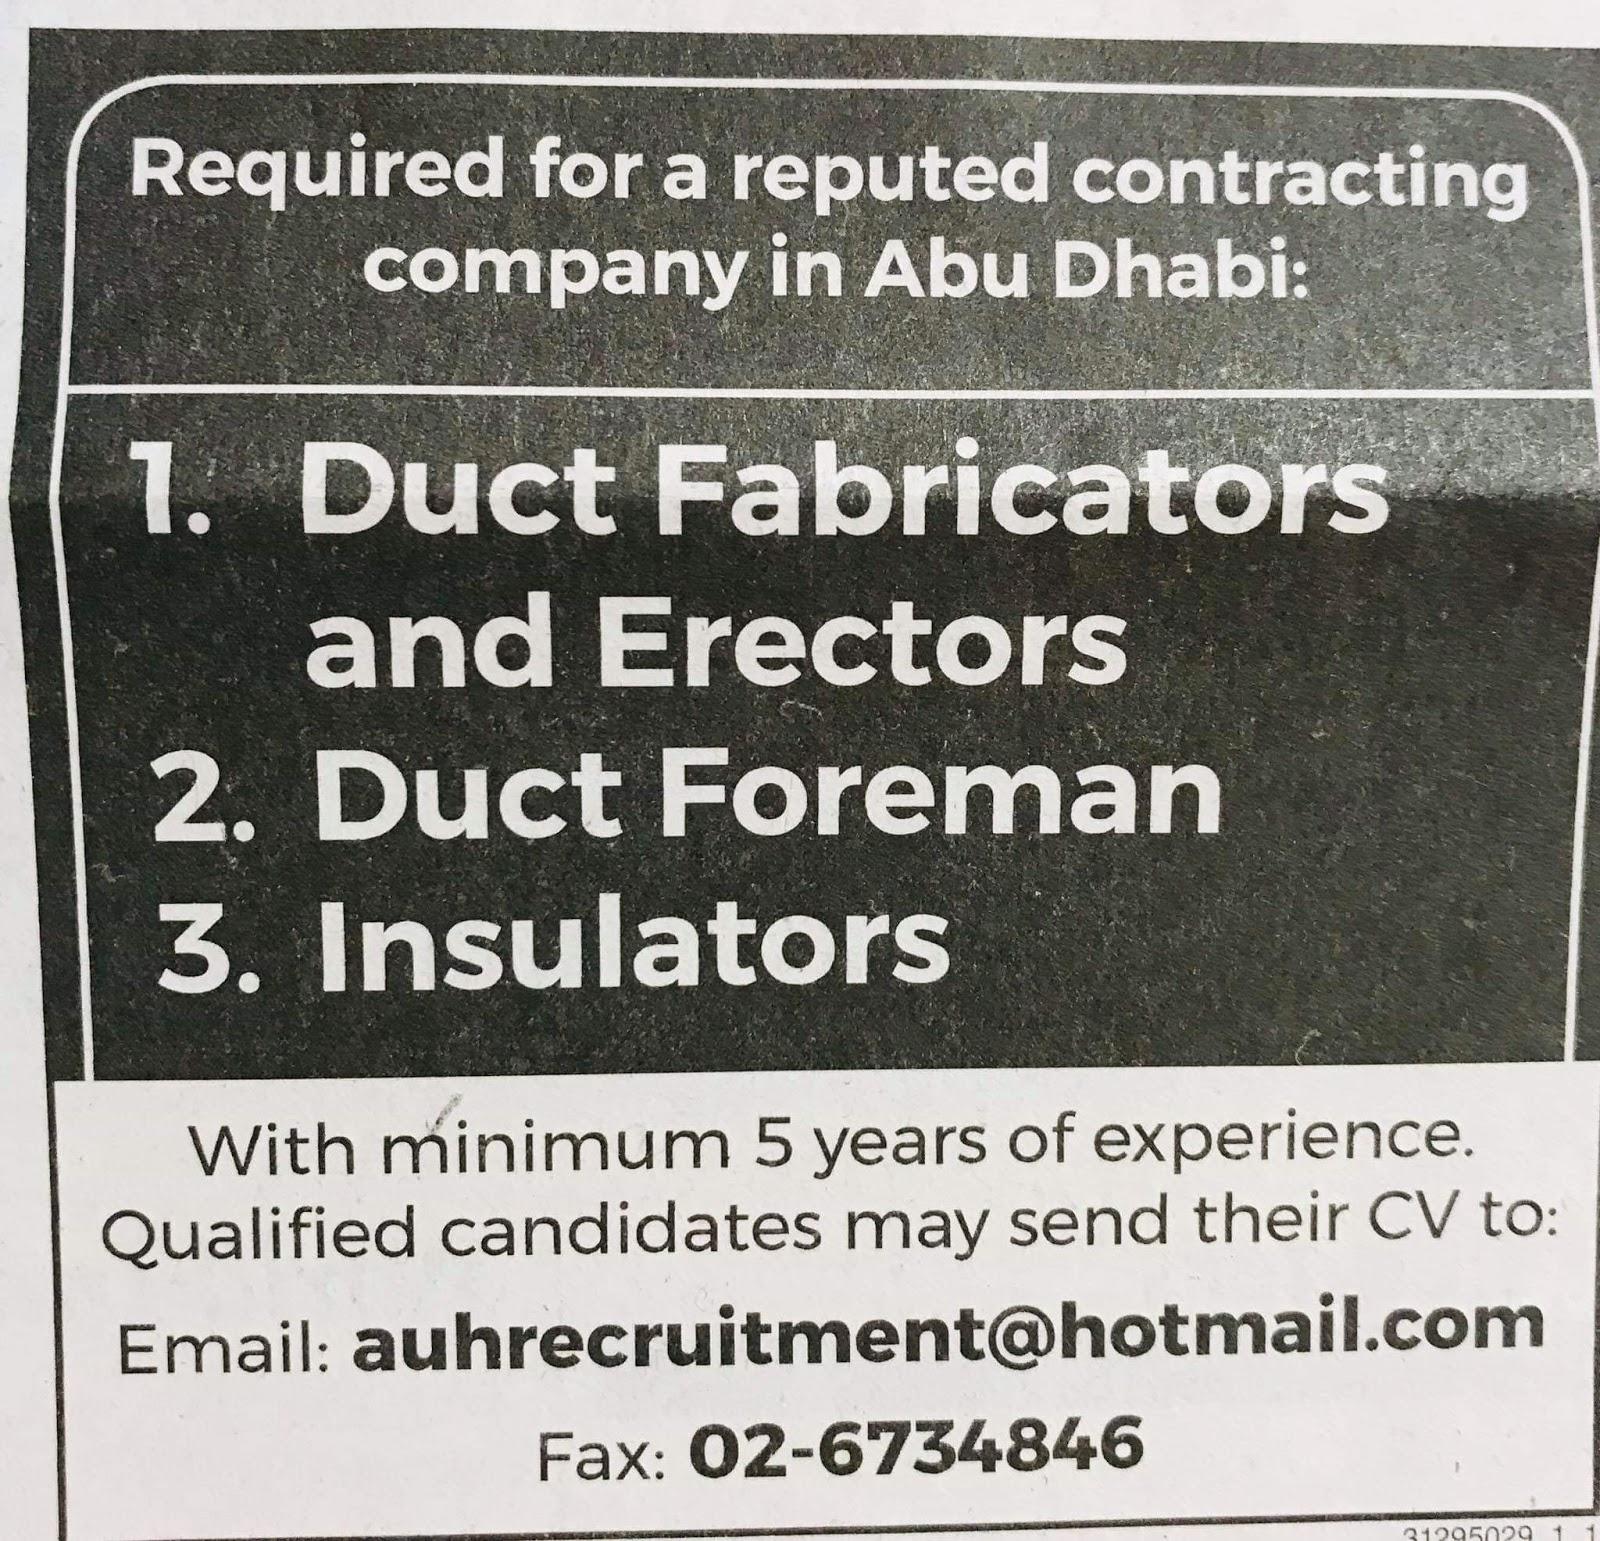 gulf news jobs ads 19/11/2018 - وظائف شاغرة فى الامارات